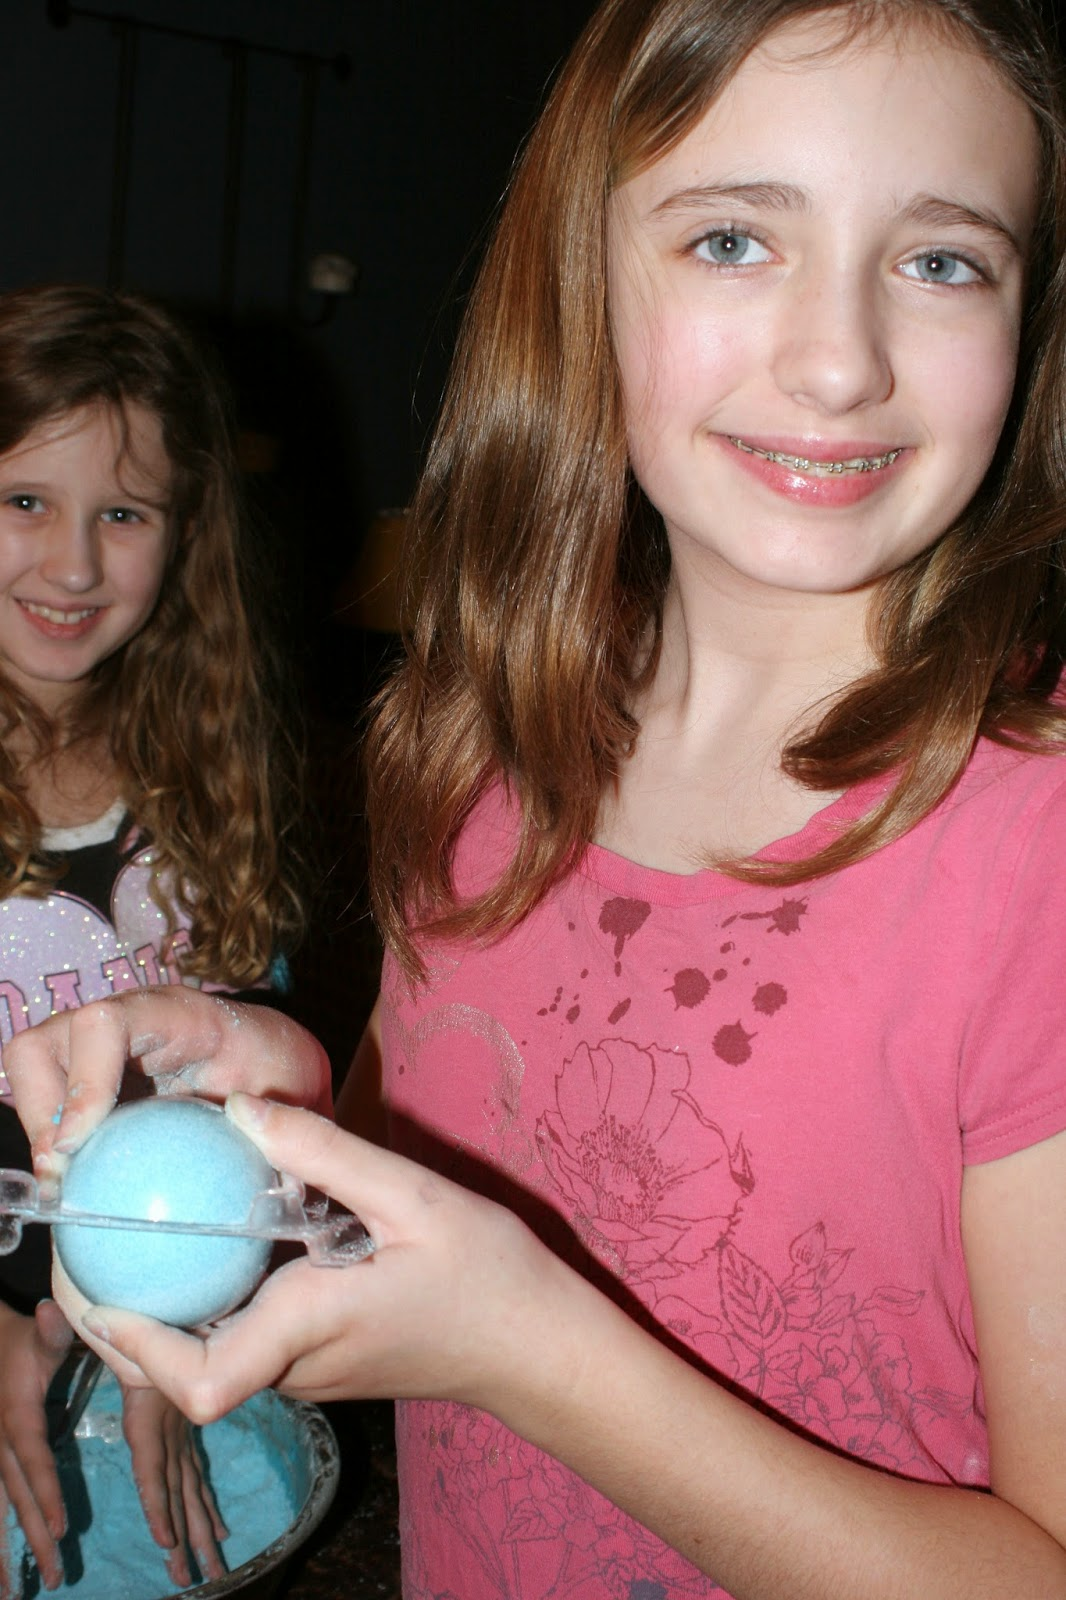 kids, kid friendly, kid friendly crafts, crafts, bath bombs, vase, Valentine's, diy, bracelets